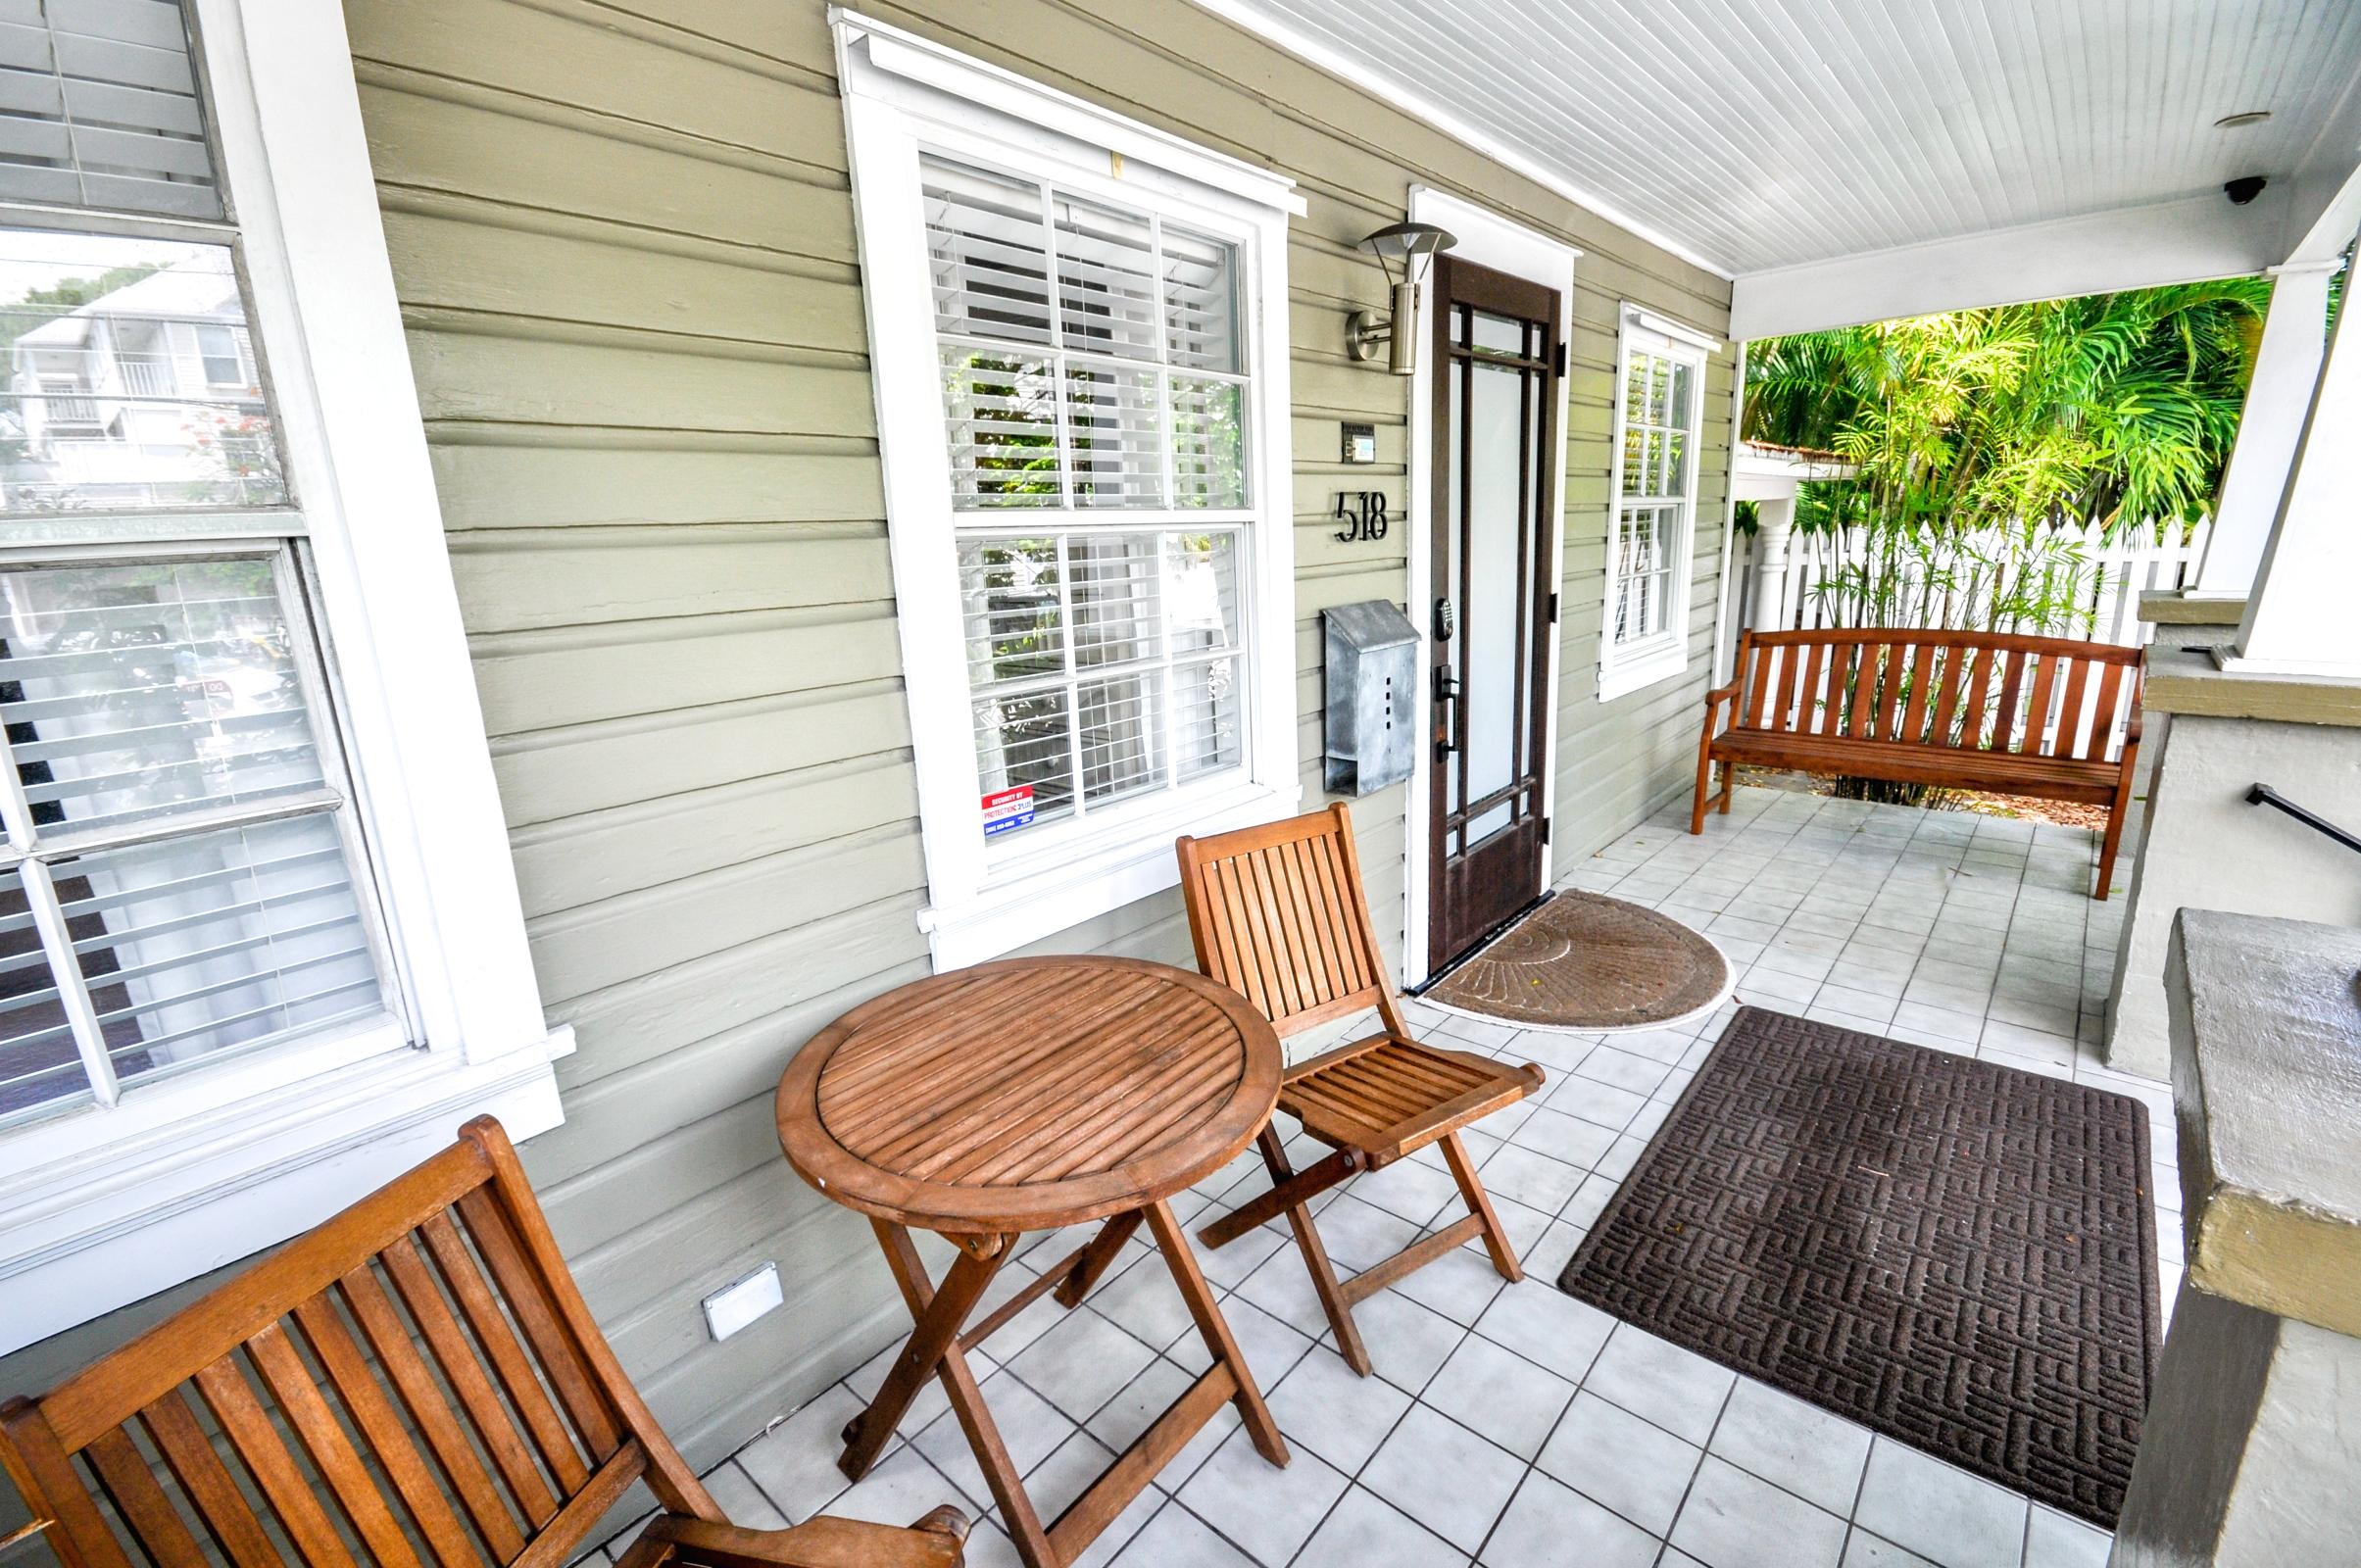 Miraculous Key West Historic District Vacation Rentals Rent Key West Interior Design Ideas Clesiryabchikinfo